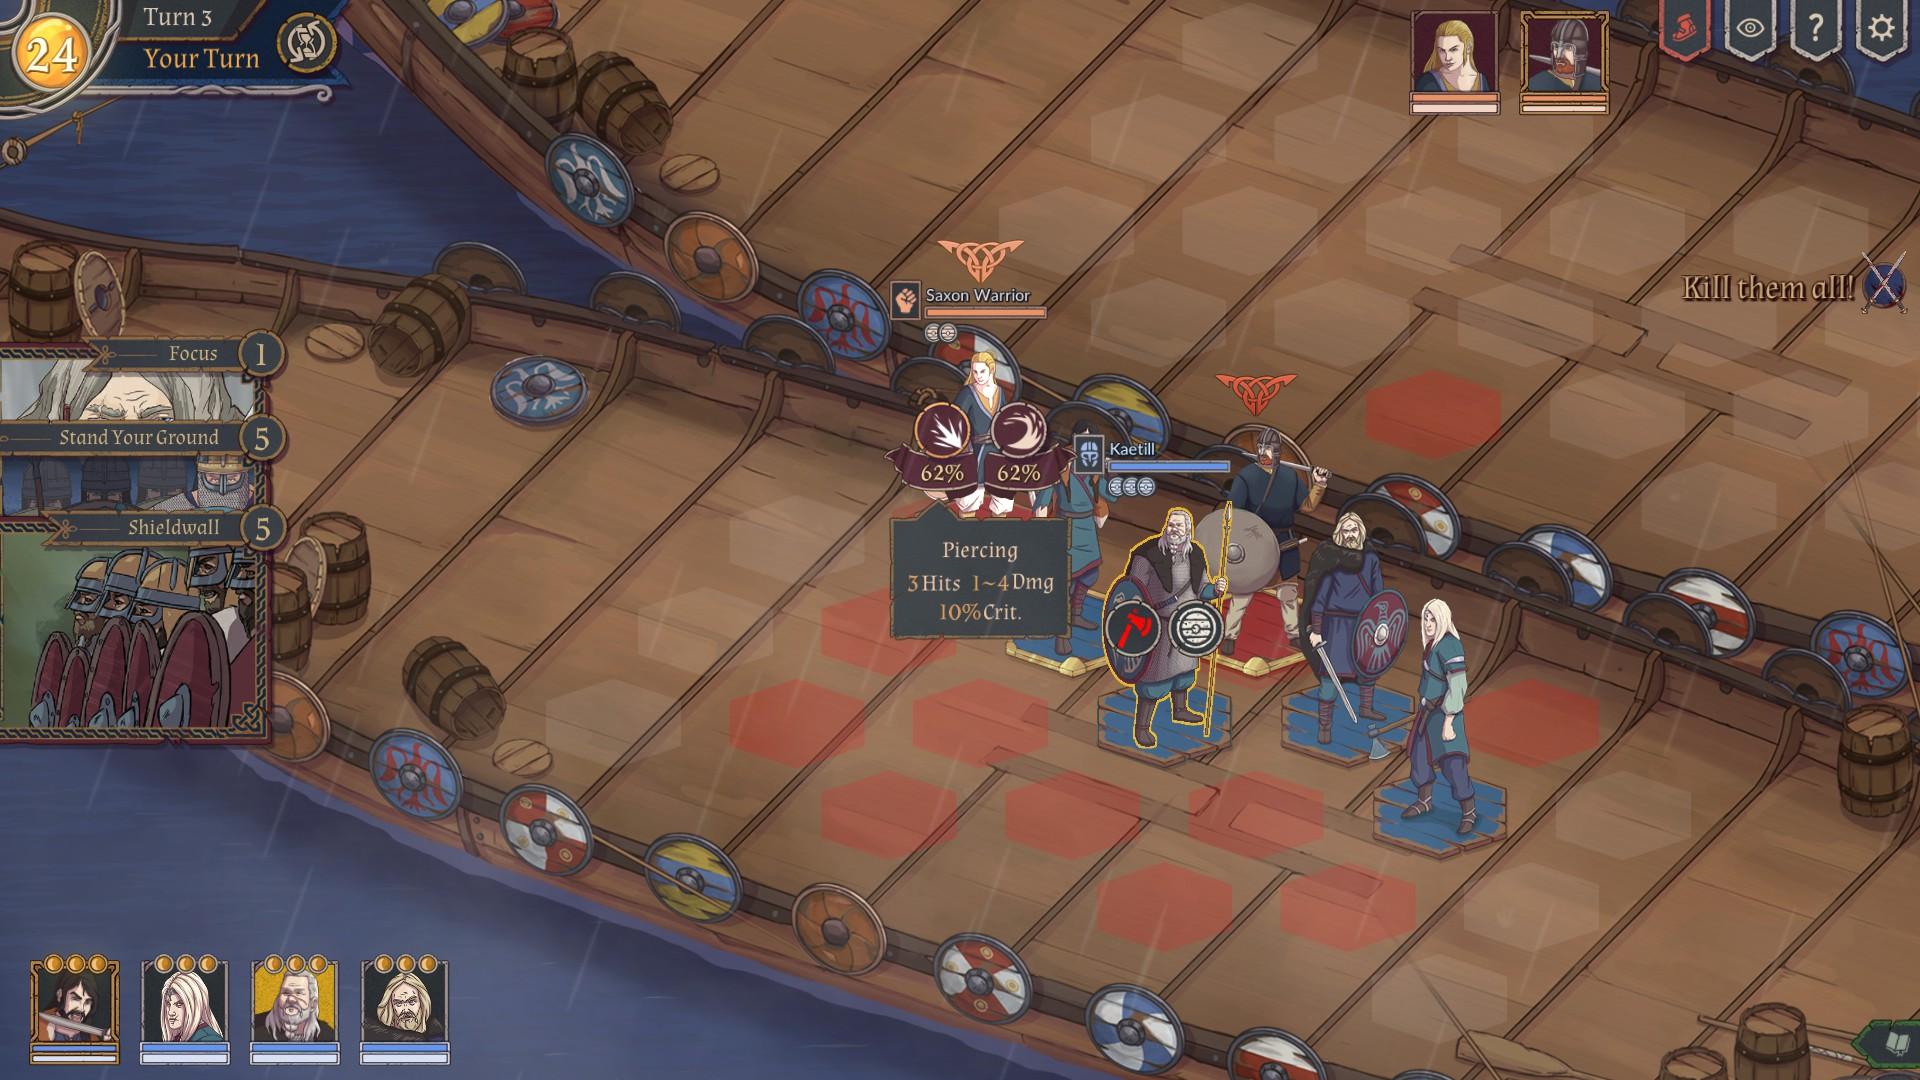 The Great Whale Road Screenshot 1